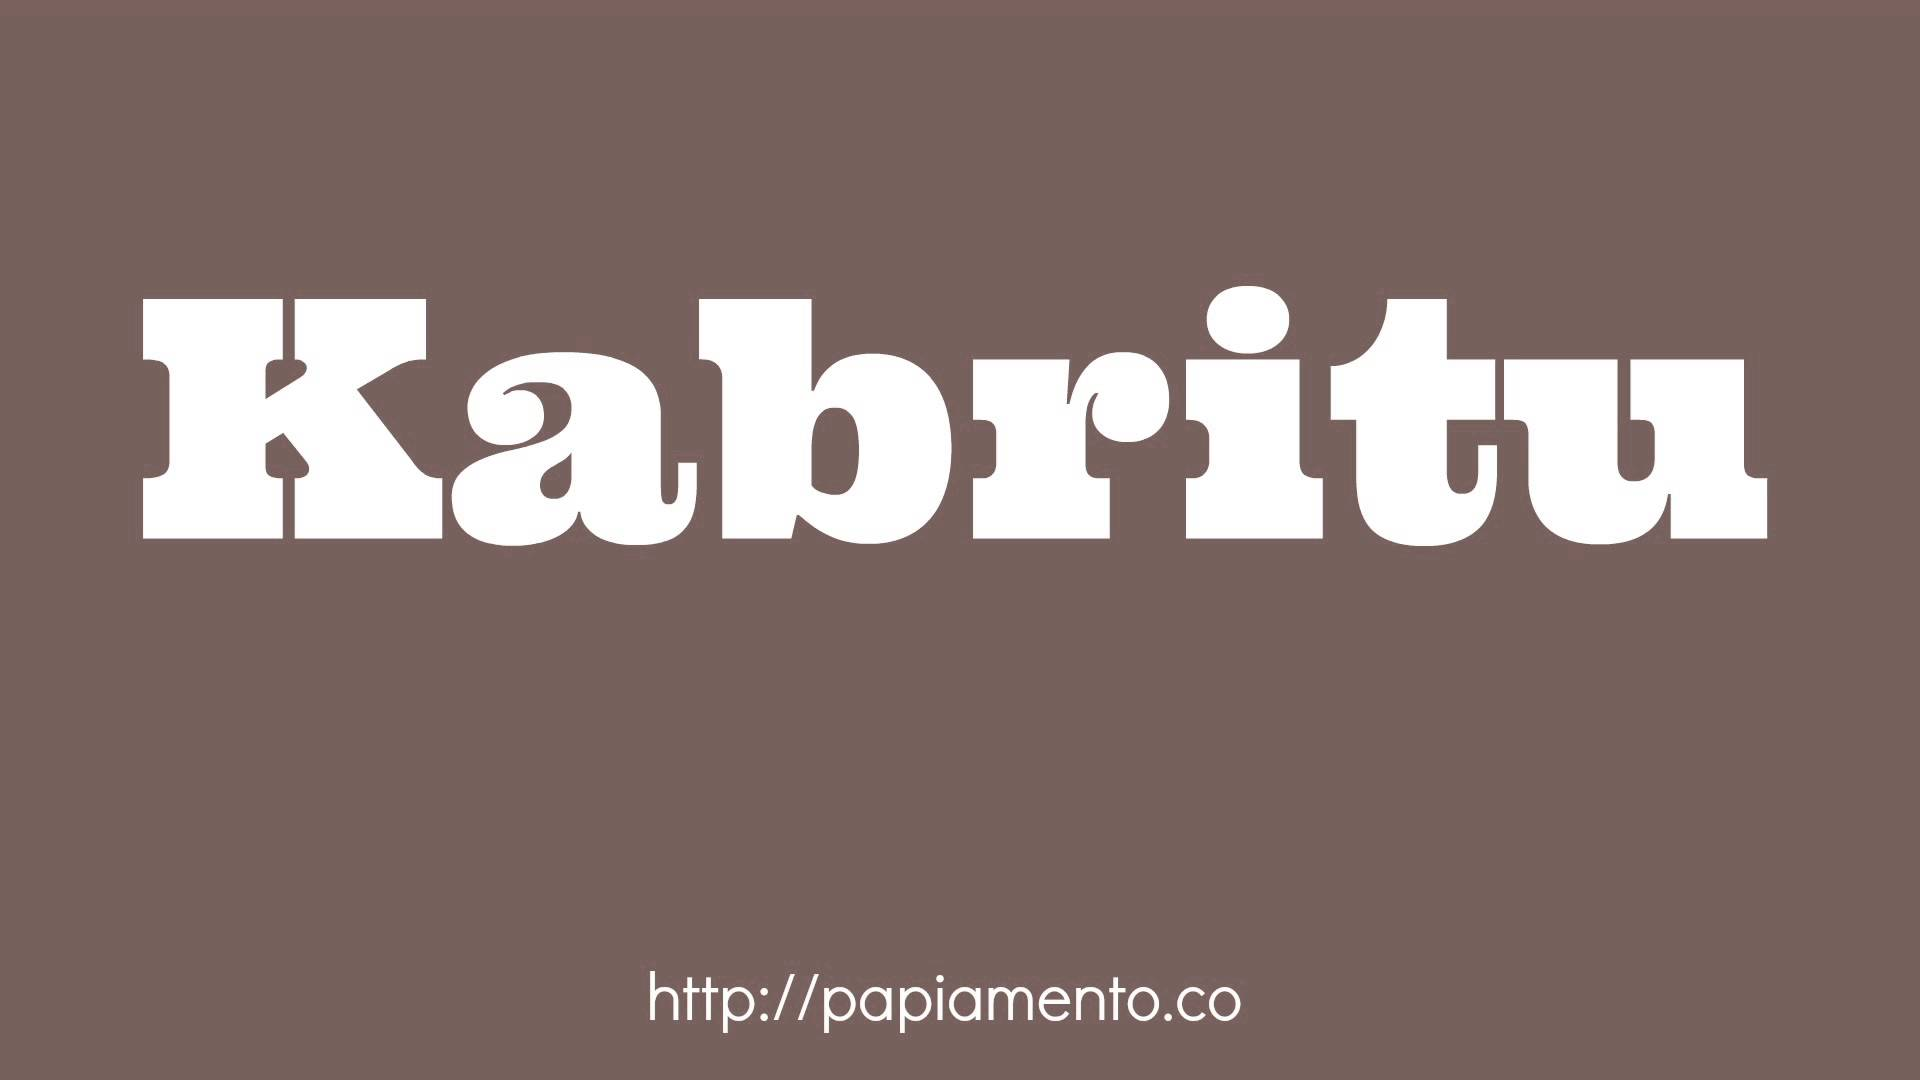 Zo zeg je Geit (kabritu) in Papiamentu - papiamentu.co